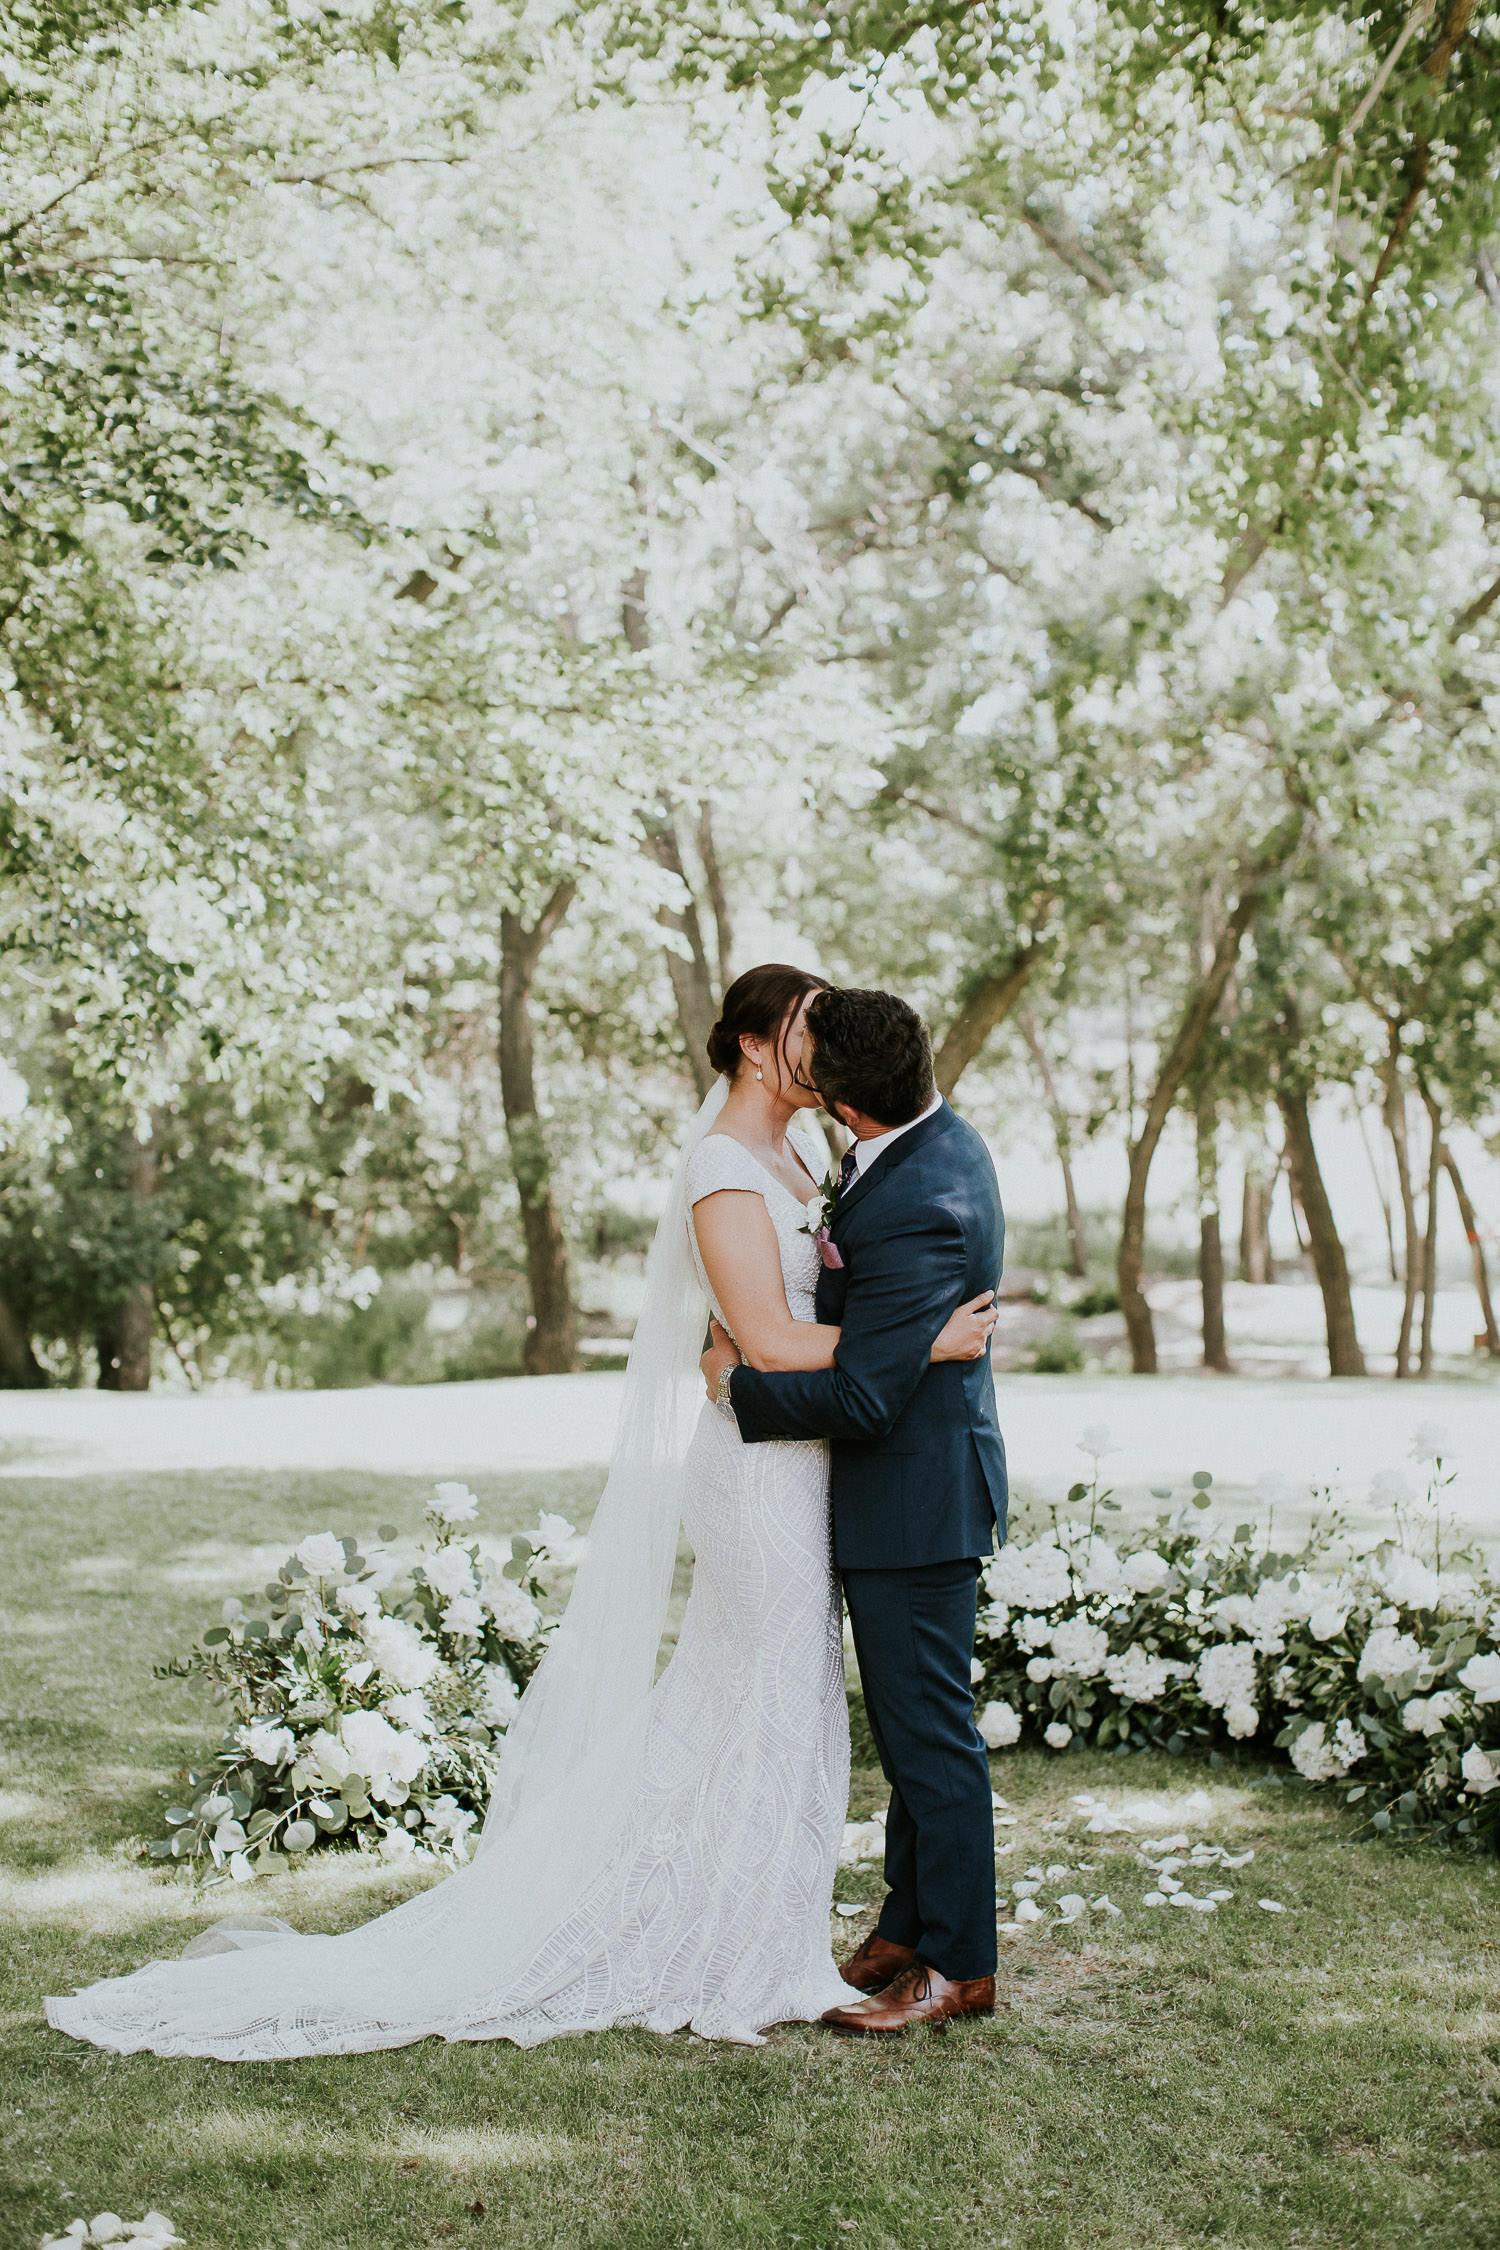 summer-backyard-wedding-in-alberta-sarah-pukin-0114